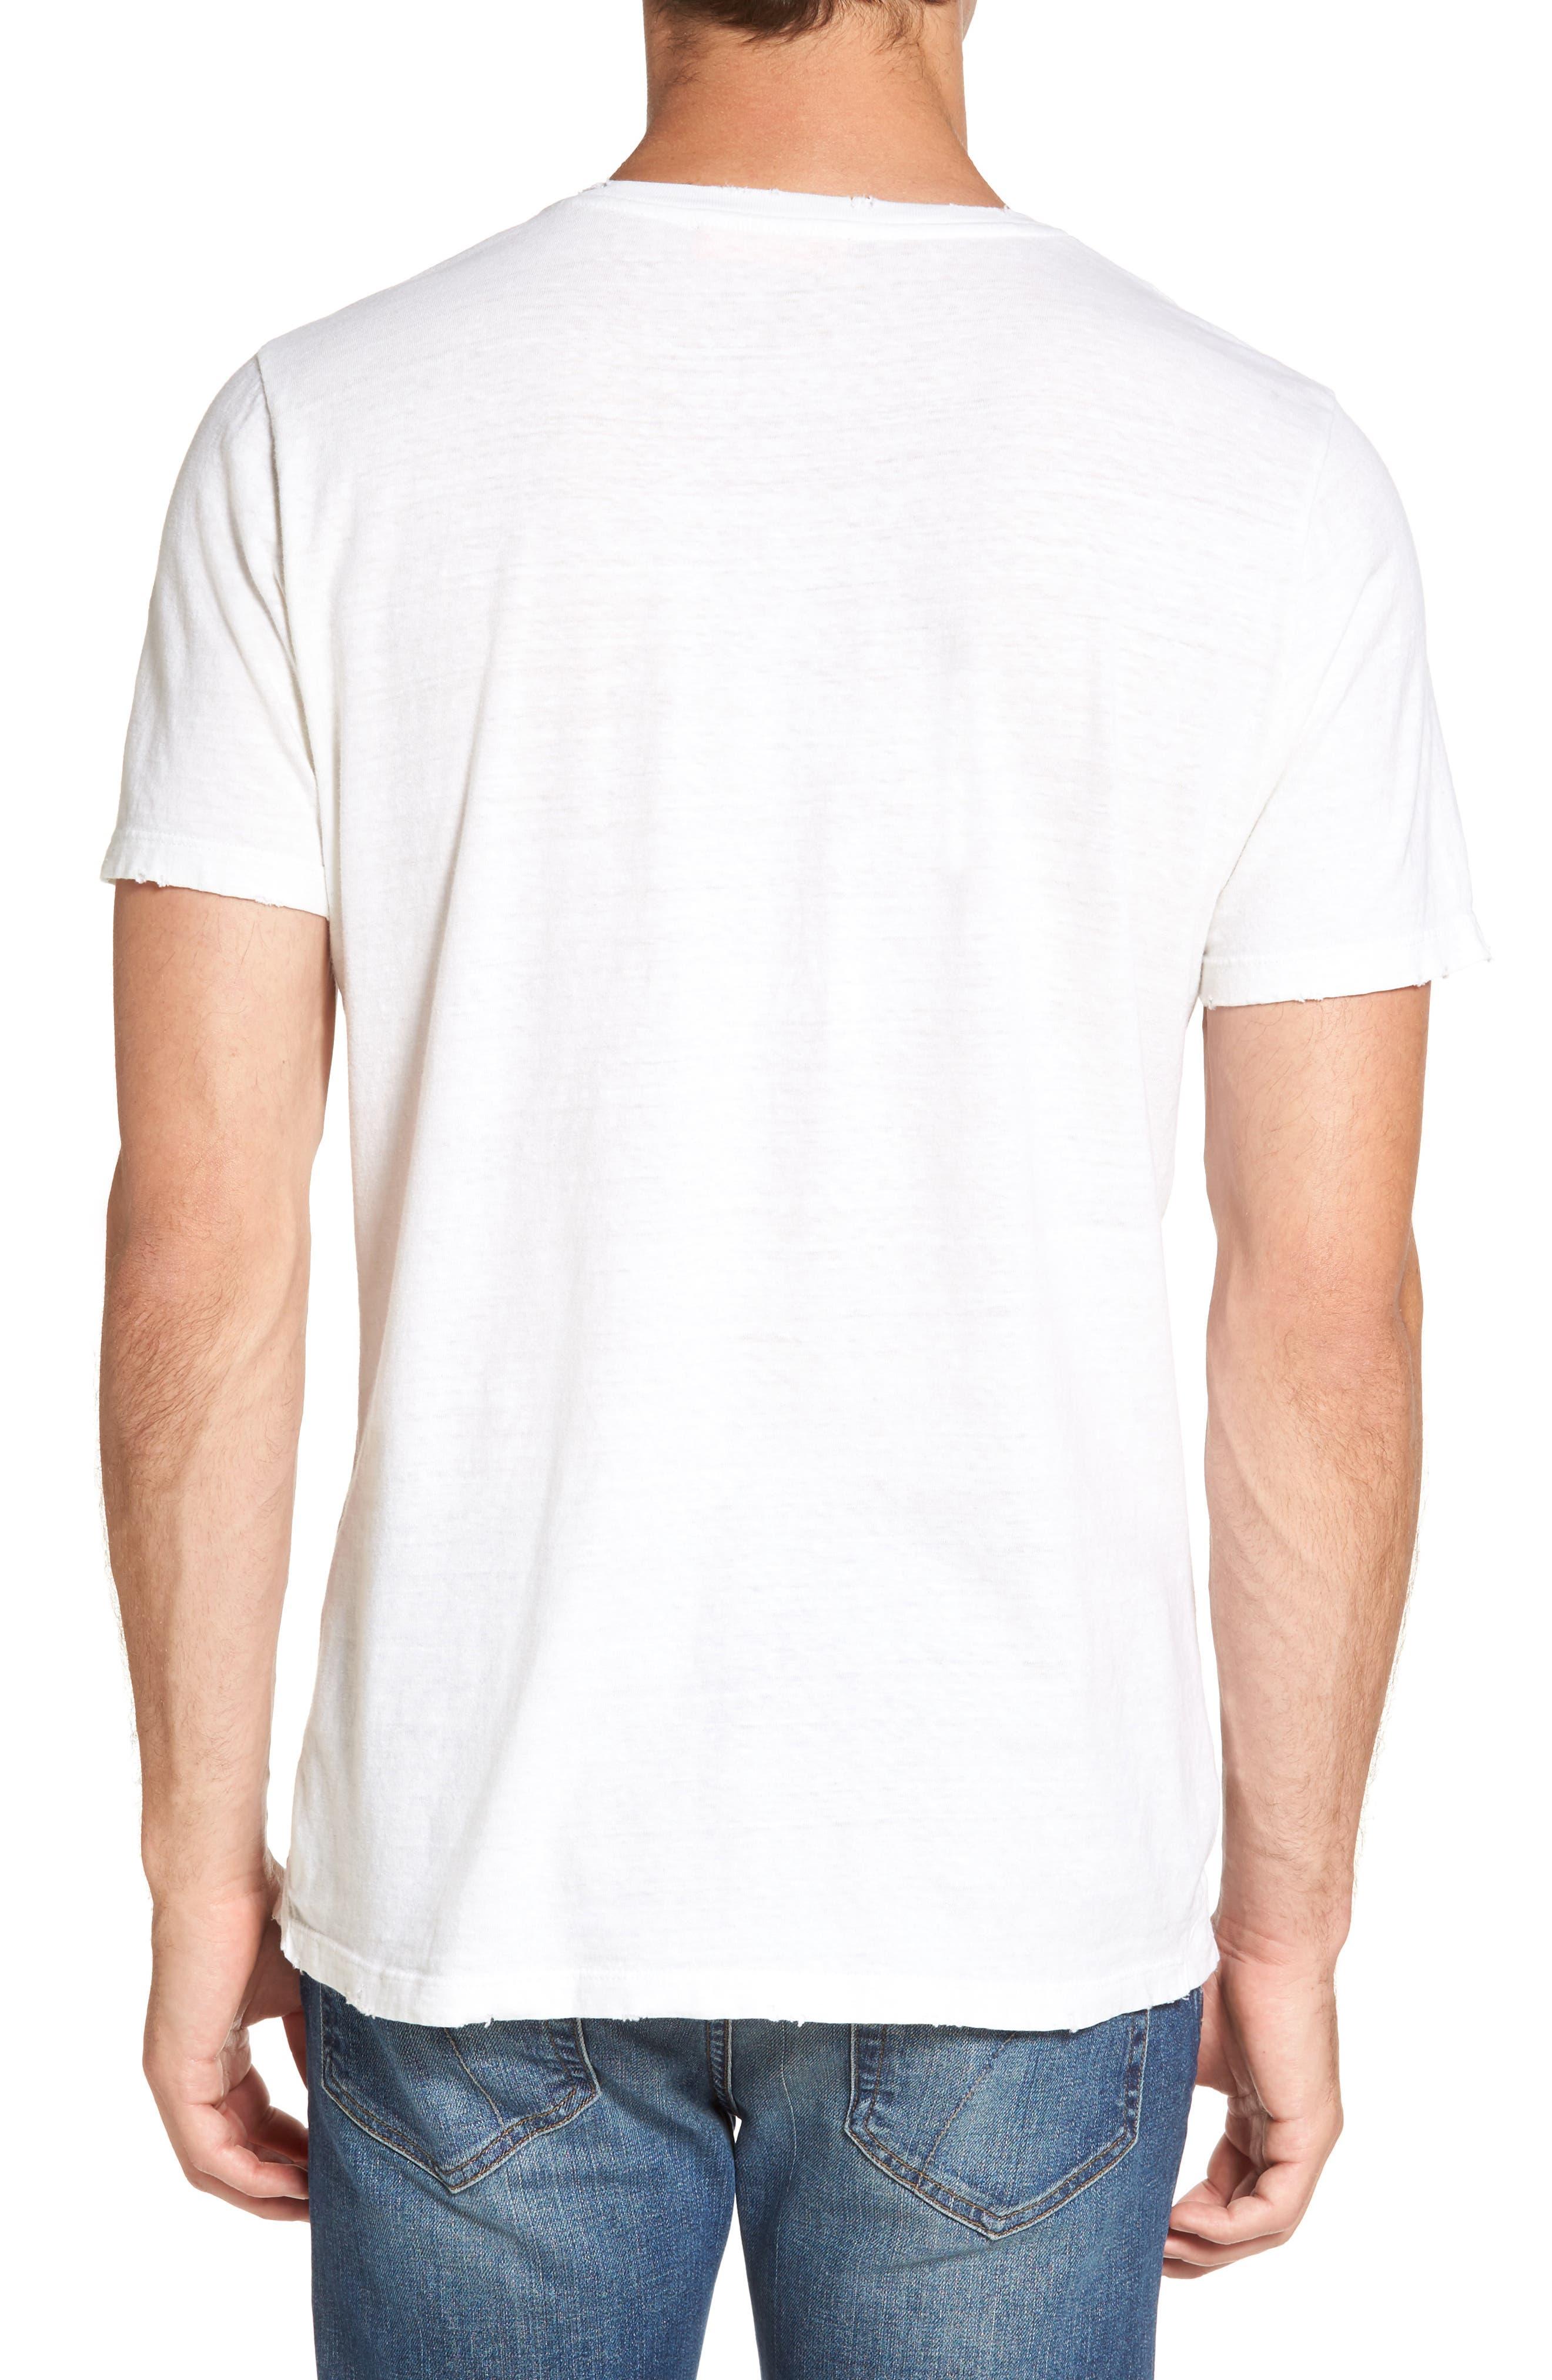 Bronco 6 T-Shirt,                             Alternate thumbnail 2, color,                             100